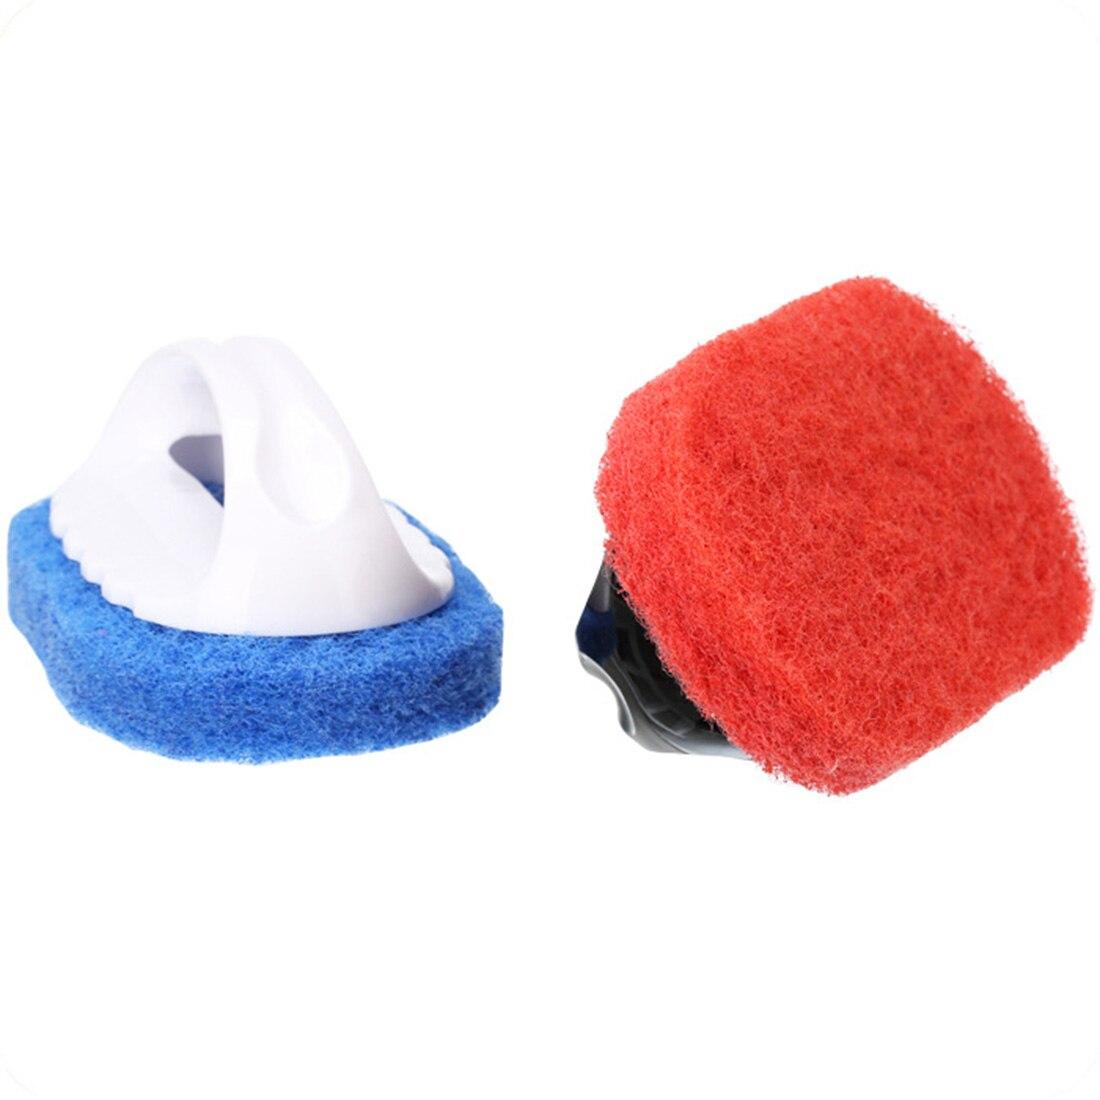 Top Sale Magic sponge brush Kitchen bathroom window smoke lampblack machine cleaner Cleaning tool handle cleaning brush